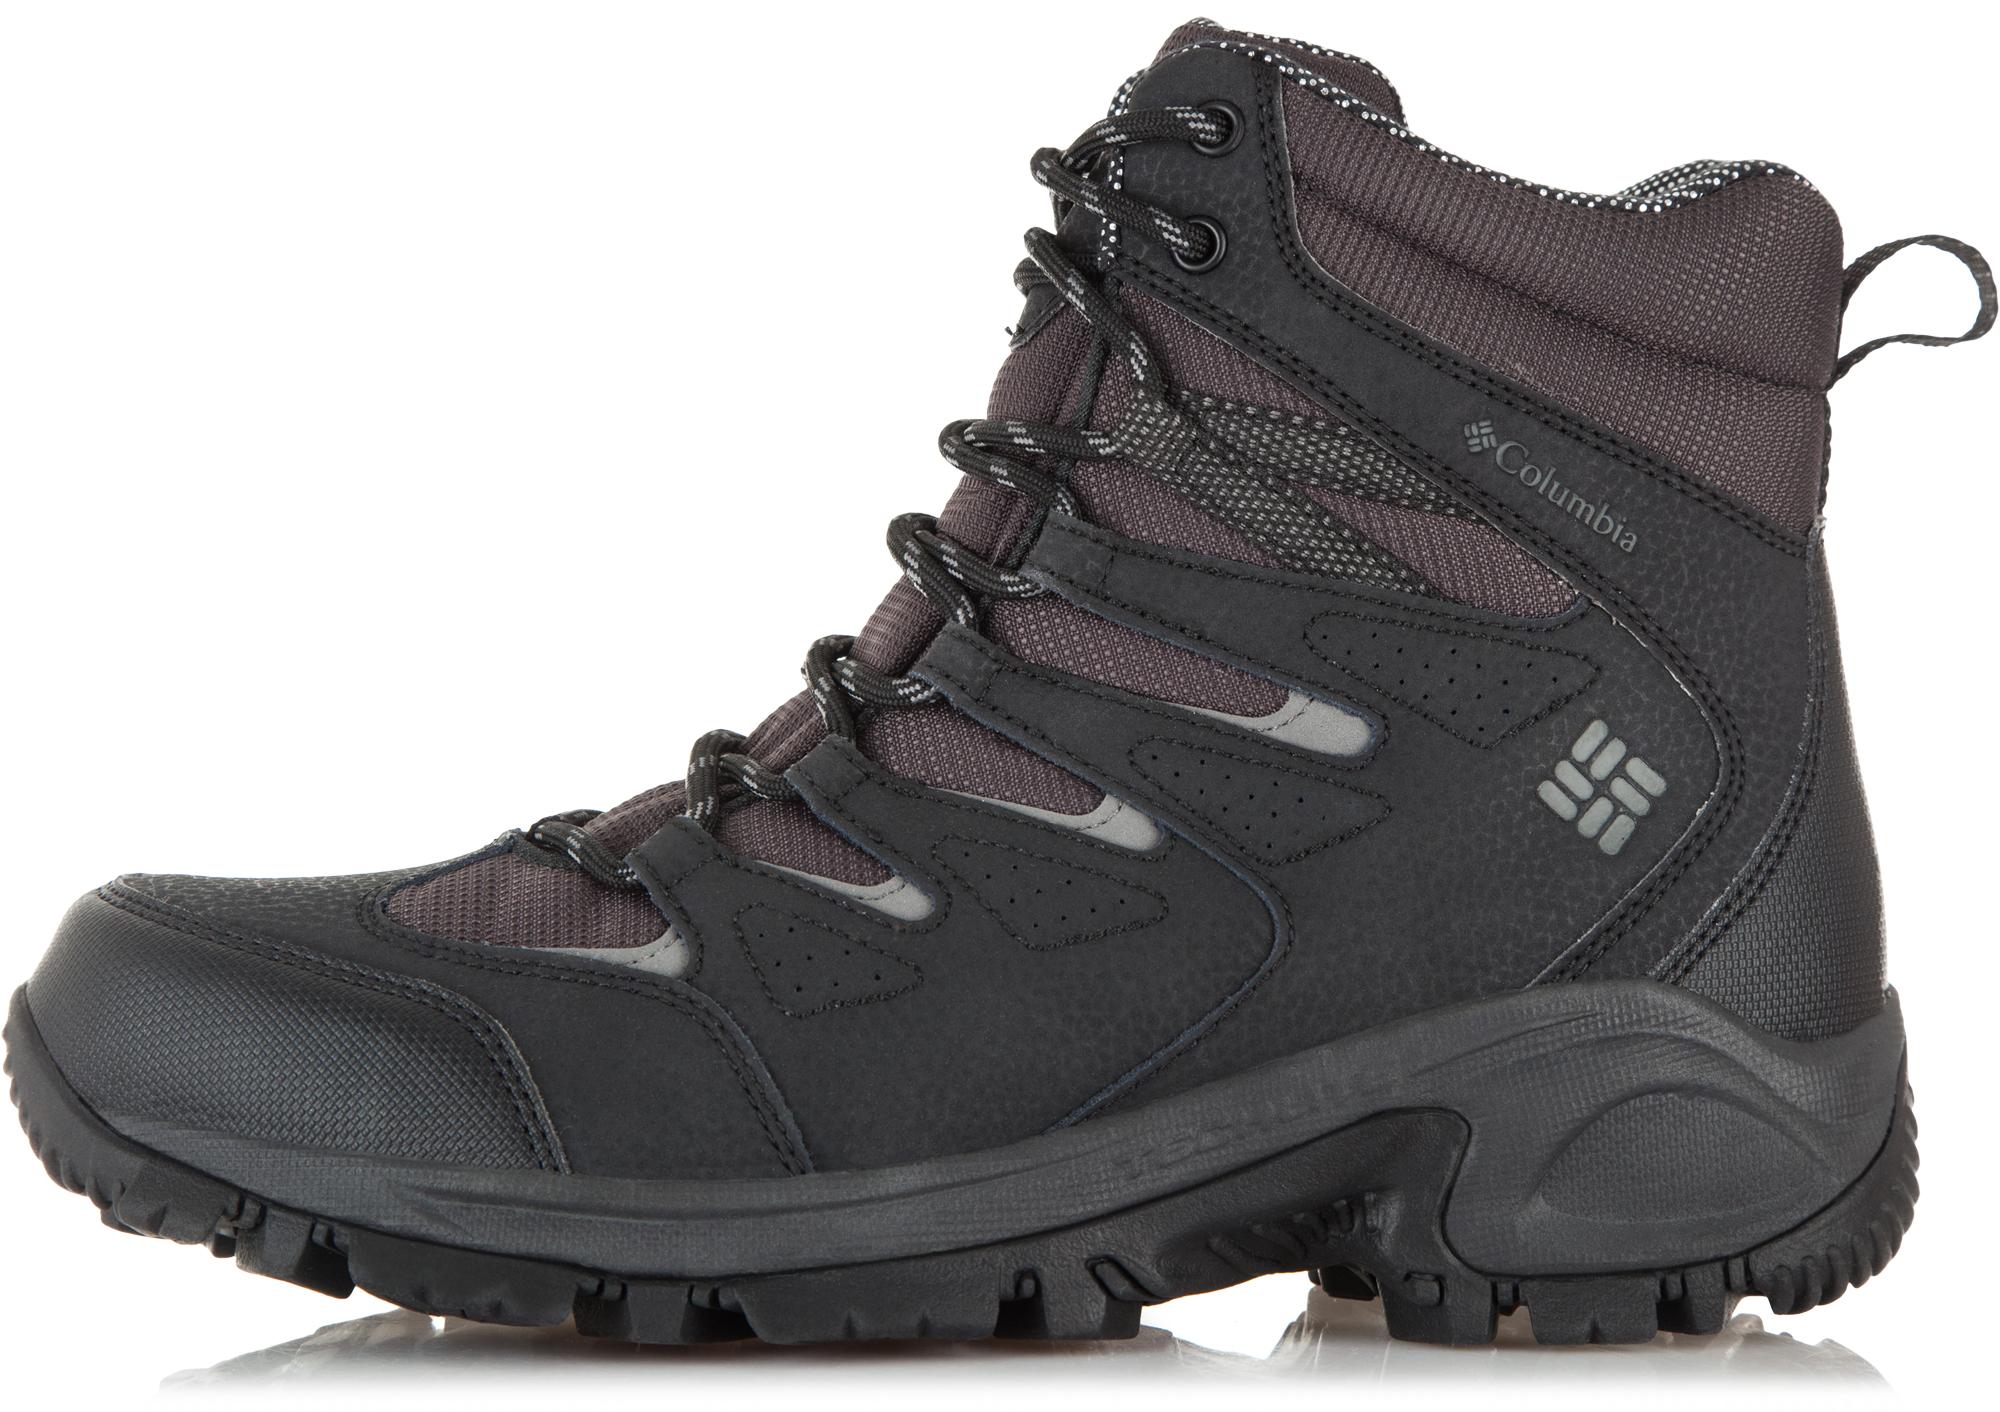 Columbia Ботинки утепленные мужские Columbia Gunnison Omni-Heat, размер 46 columbia ботинки утепленные женские columbia bugaboot plus iv omni heat размер 41